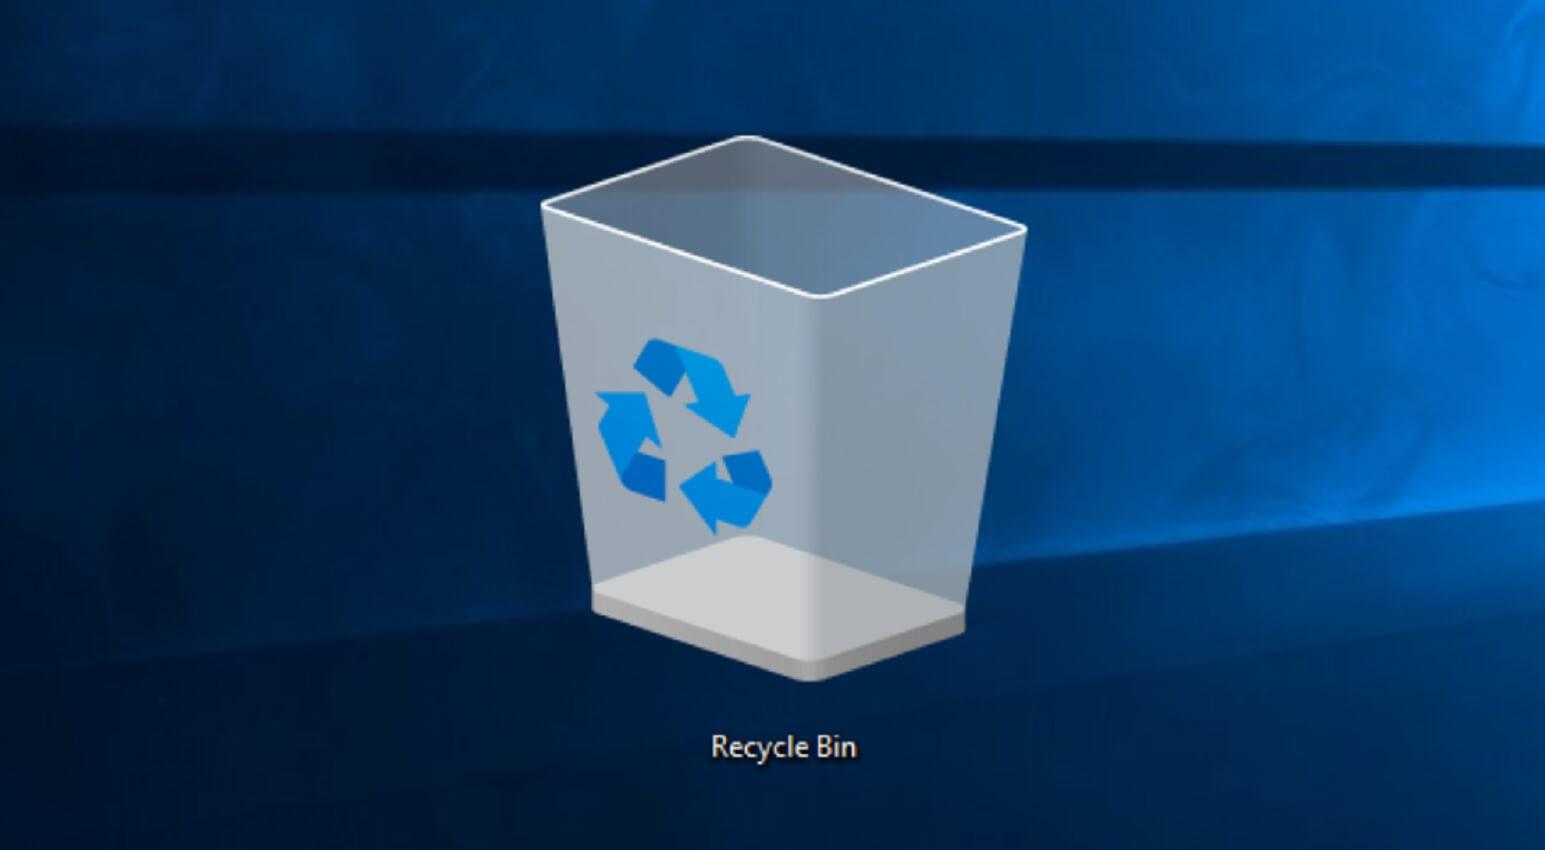 خالی کردن اتوماتیک سطل بازیافت (Recycle Bin)